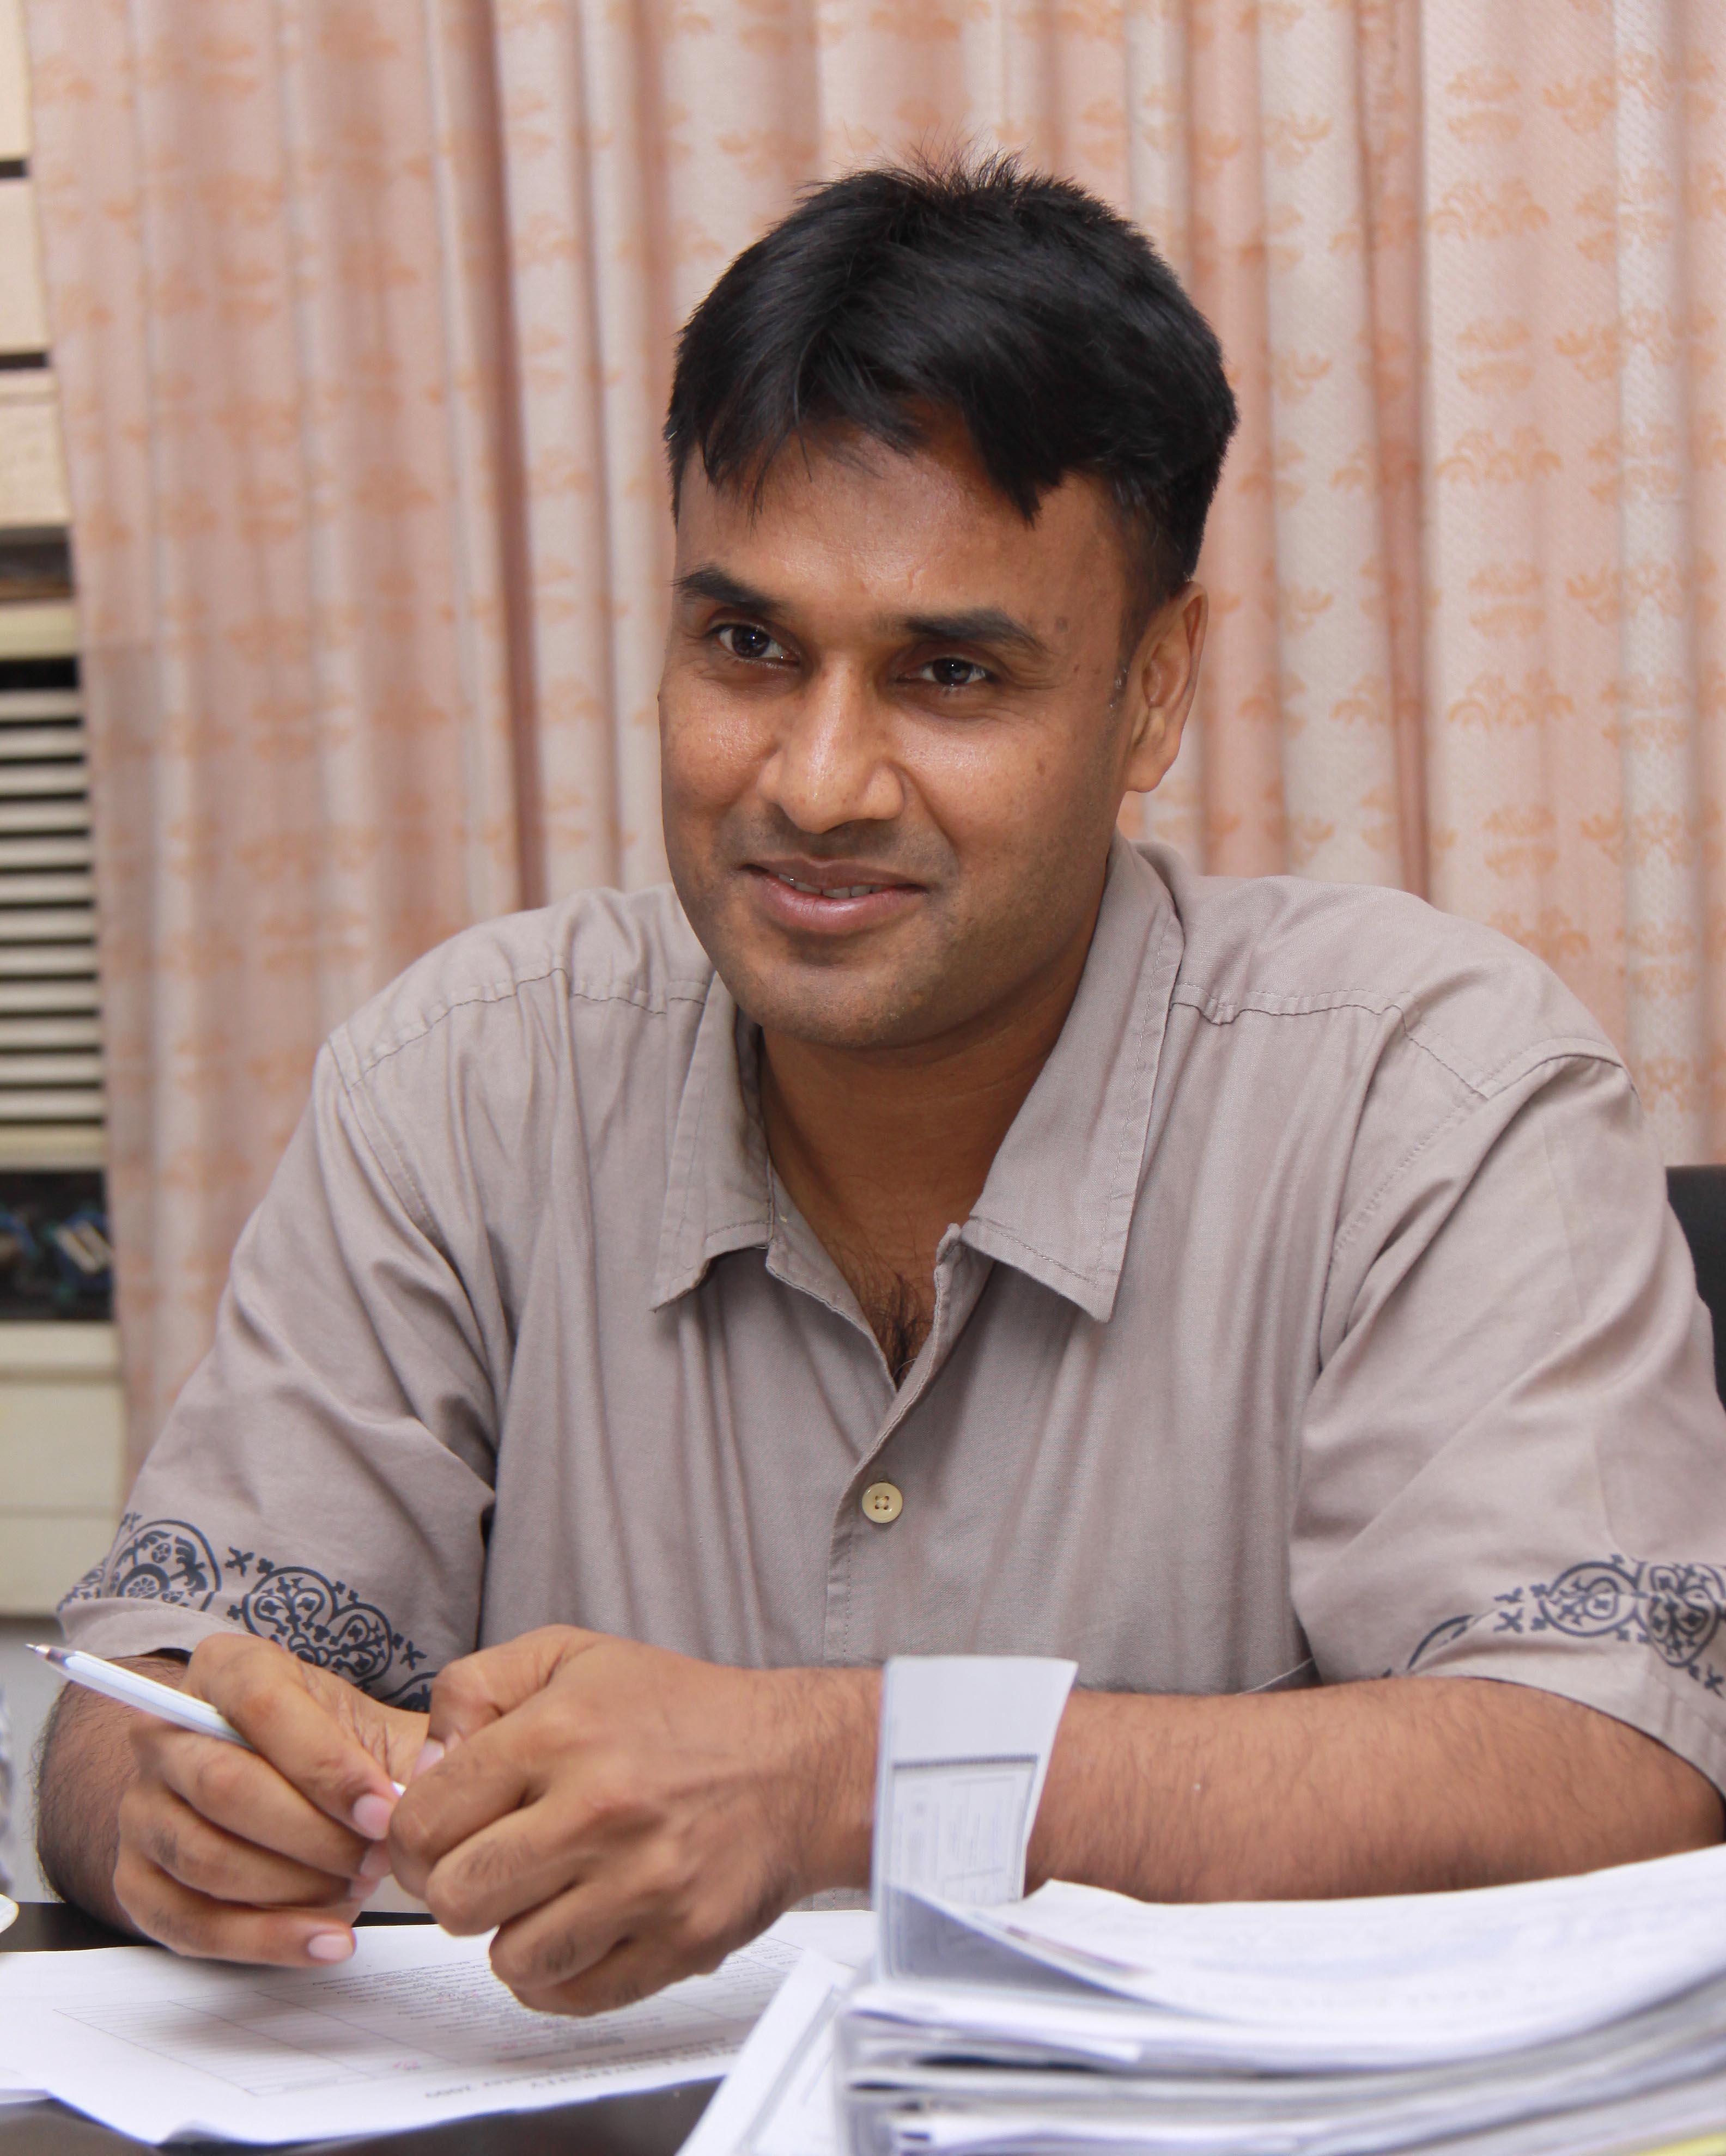 Dr. Muhammed Shahriar Haque